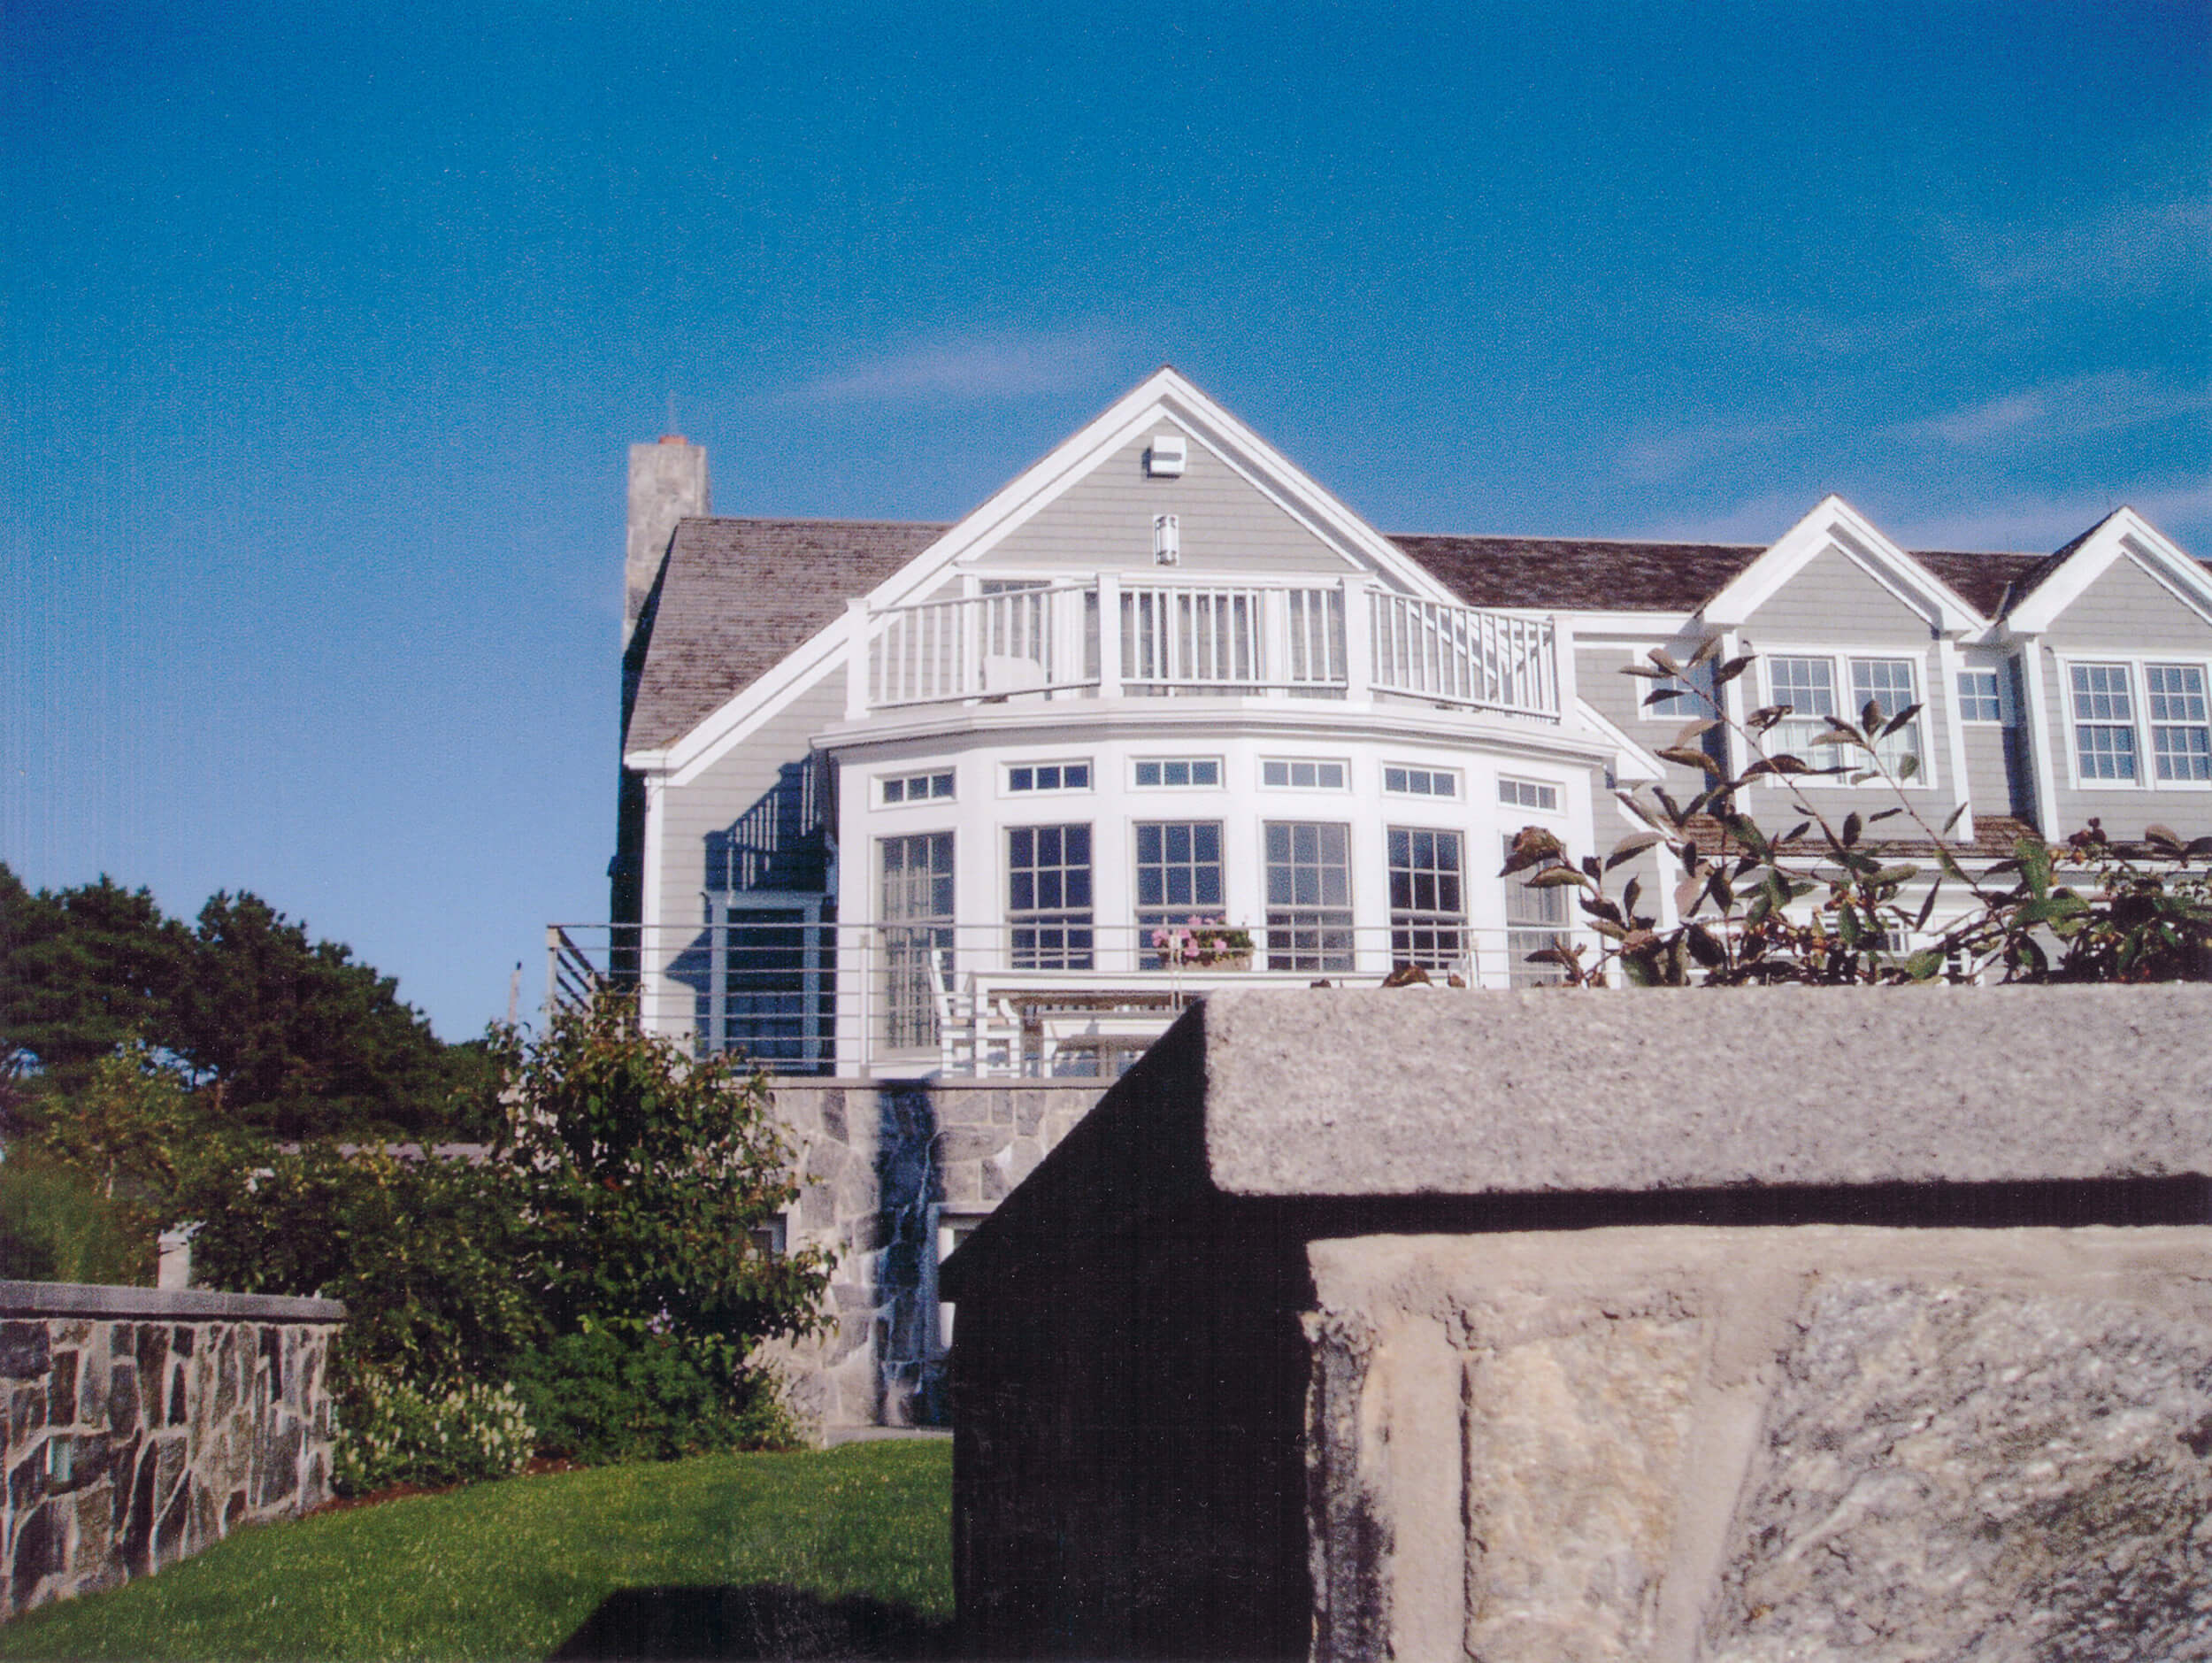 Allen_Harbor_House_Exterior.jpg